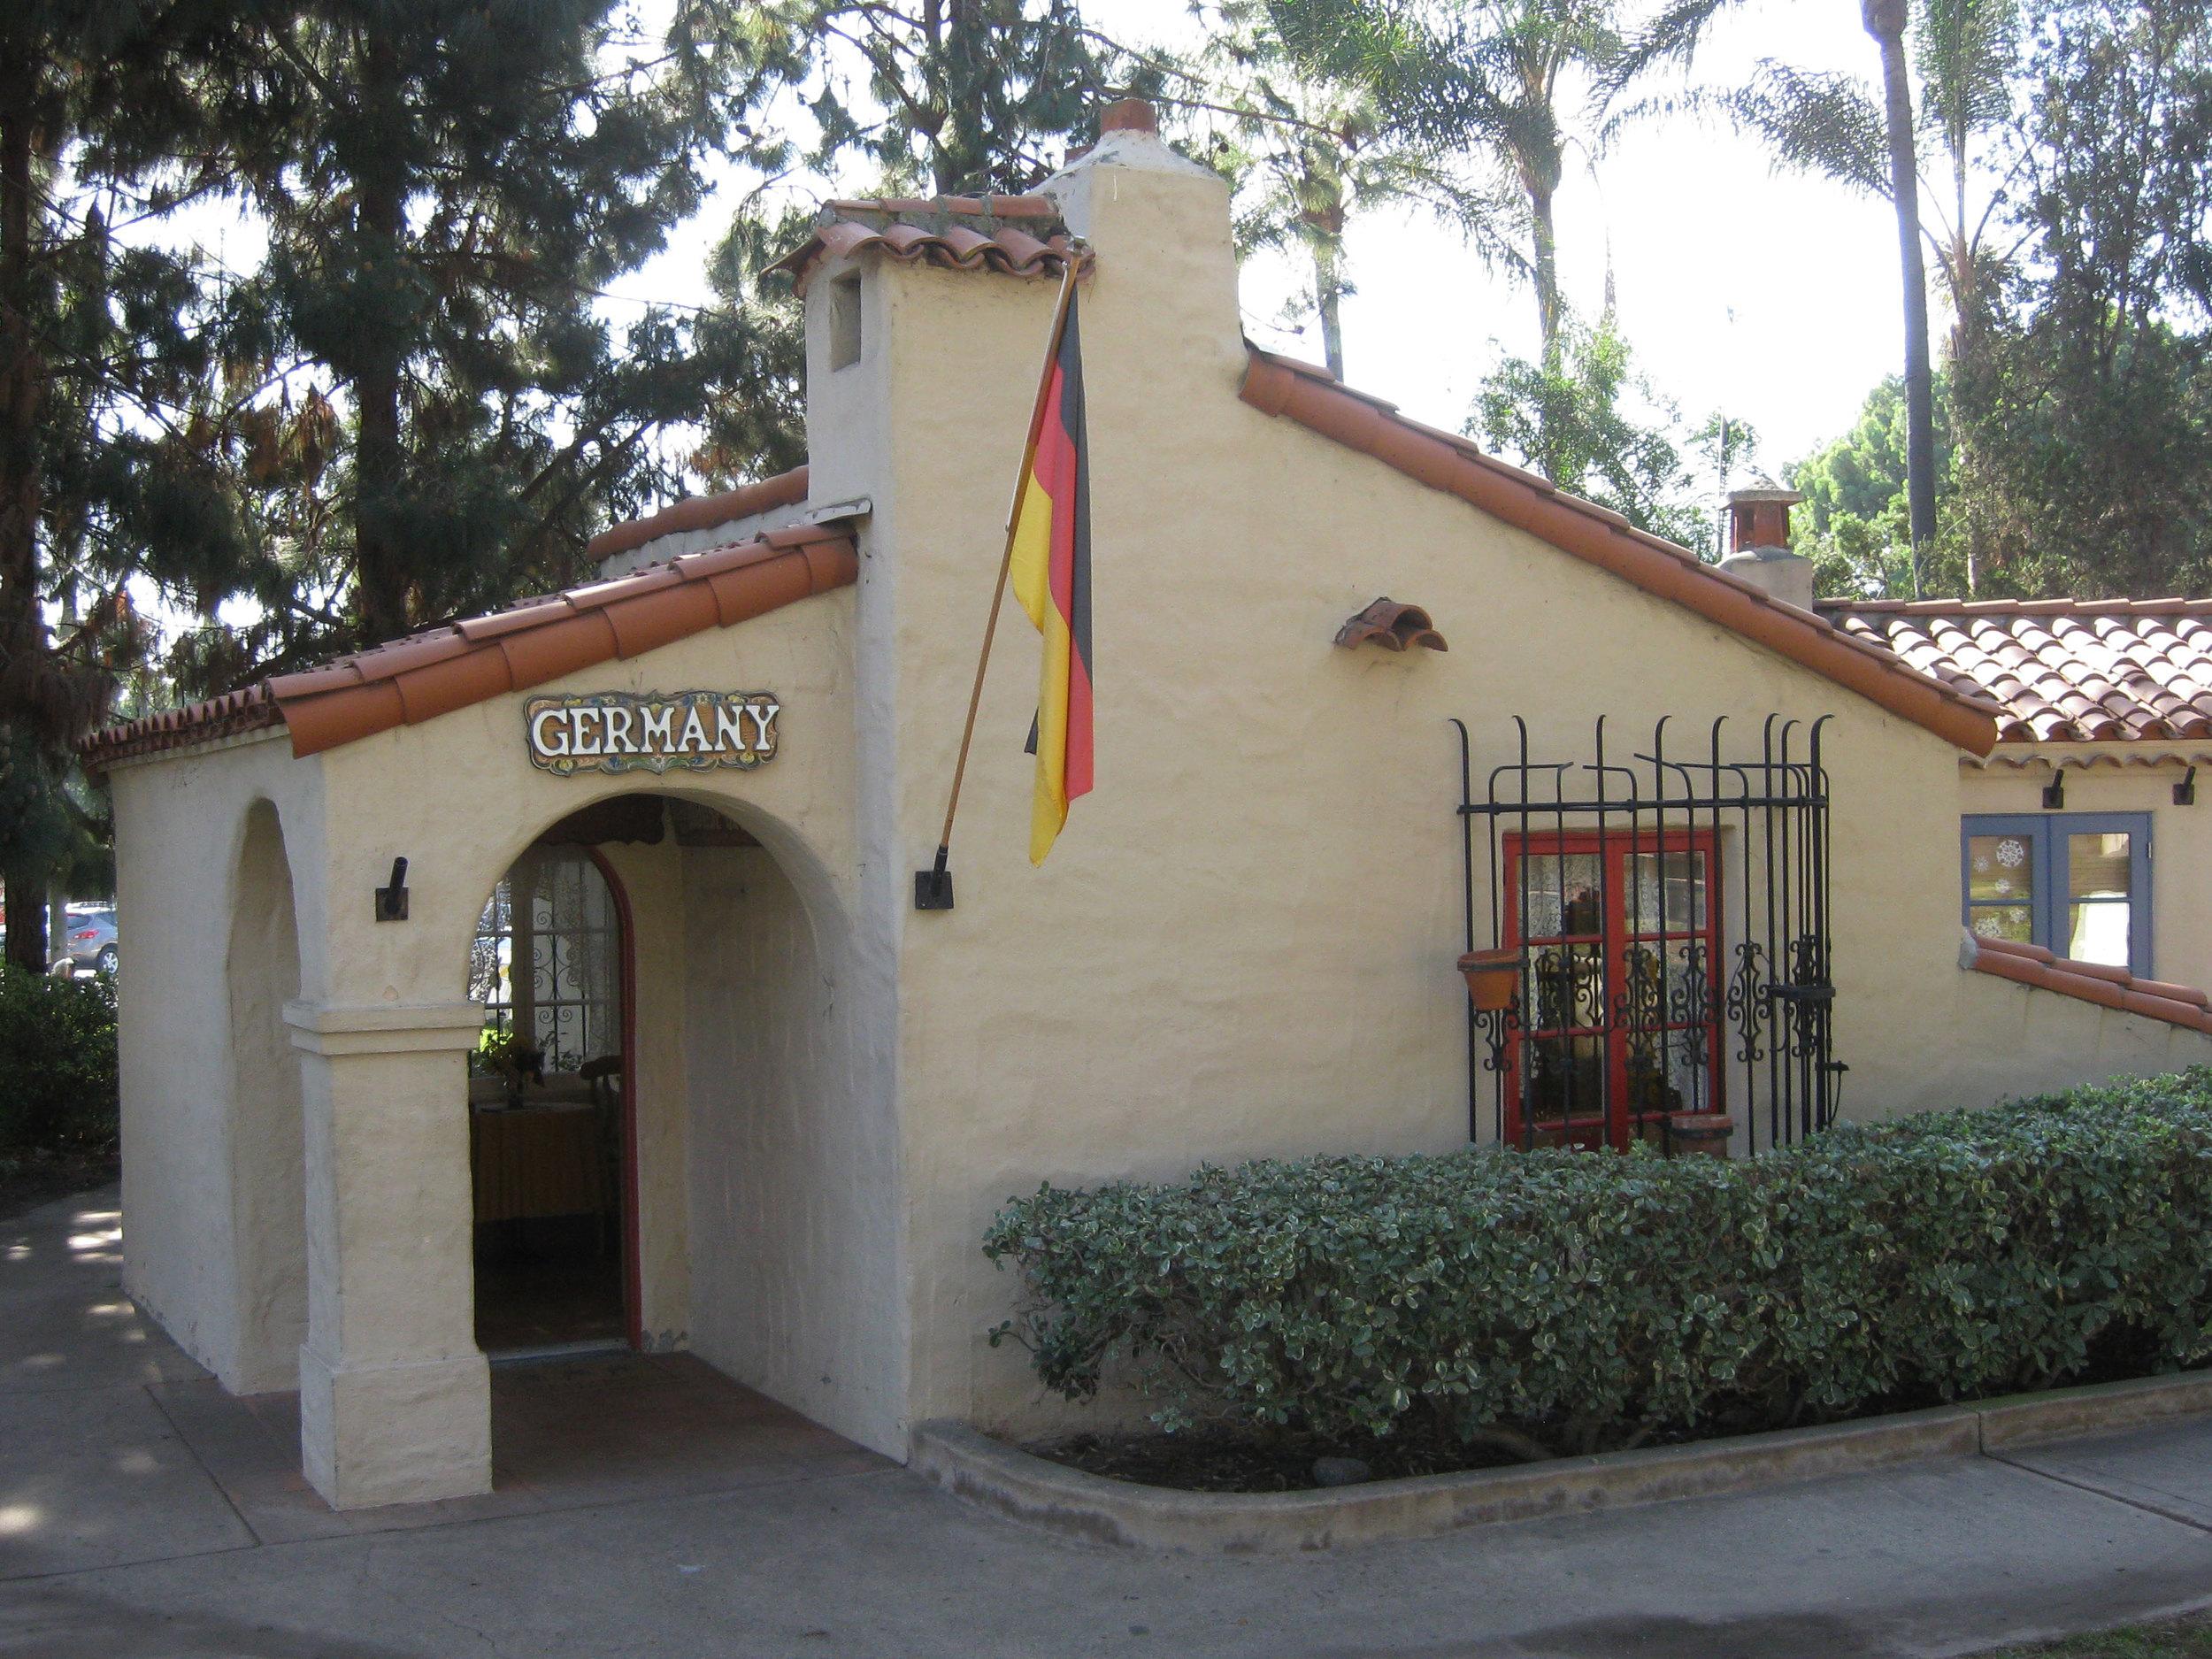 House of Germany Cottage, Balboa Park, San Diego